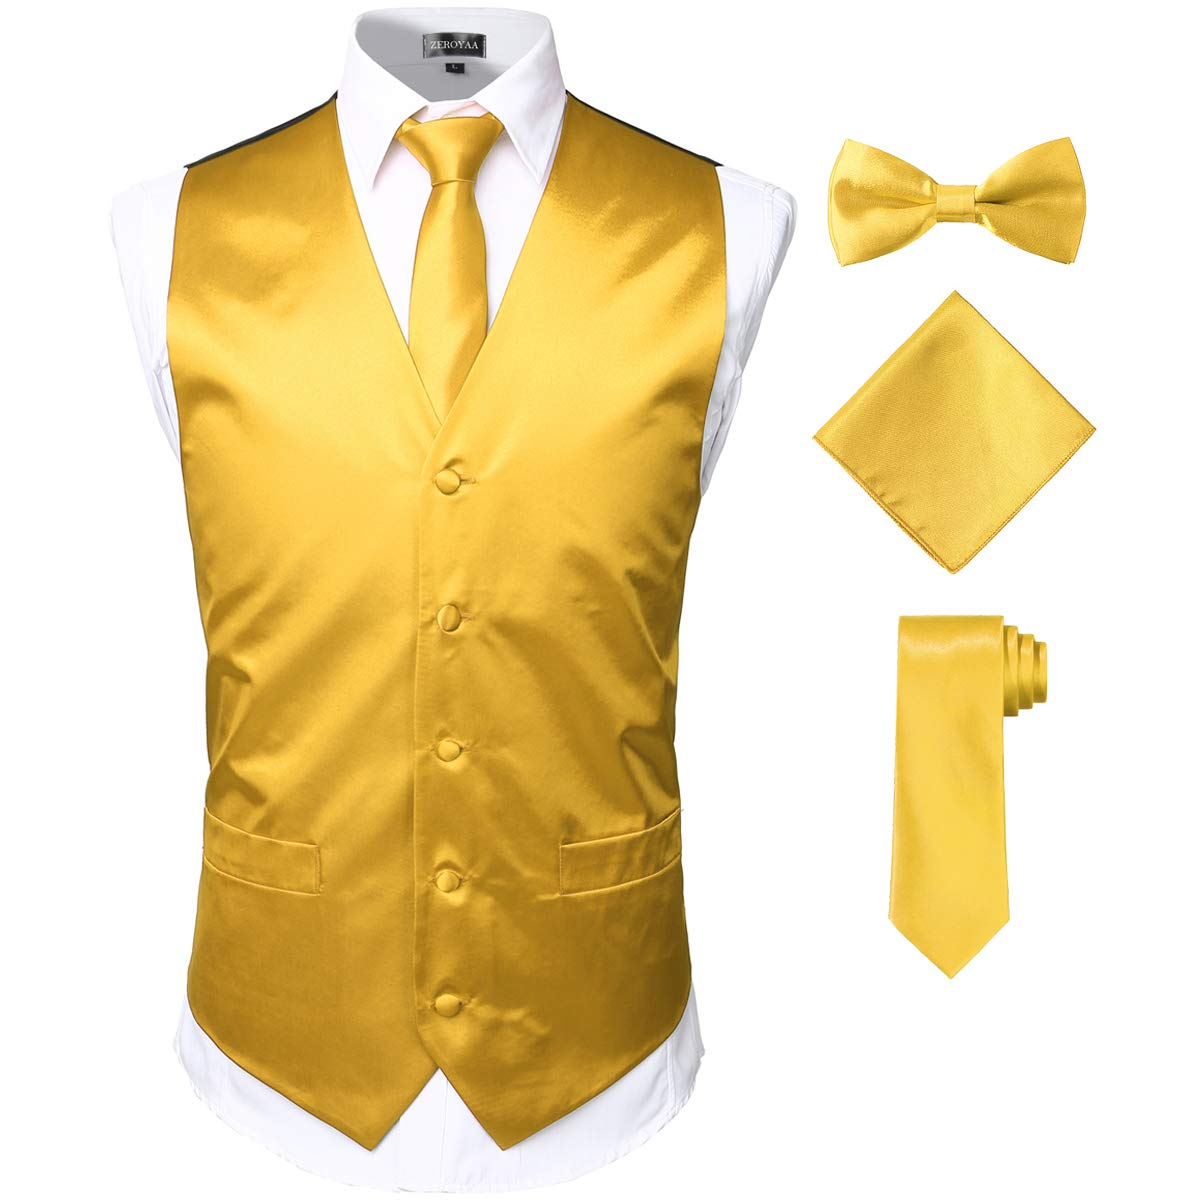 ZEROYAA Men's Solid 4pc Shiny Satin Vest Necktie Bowtie Pocket Square Set for Suit or Tuxedo ZLSV12 Gold XX-Large by ZEROYAA